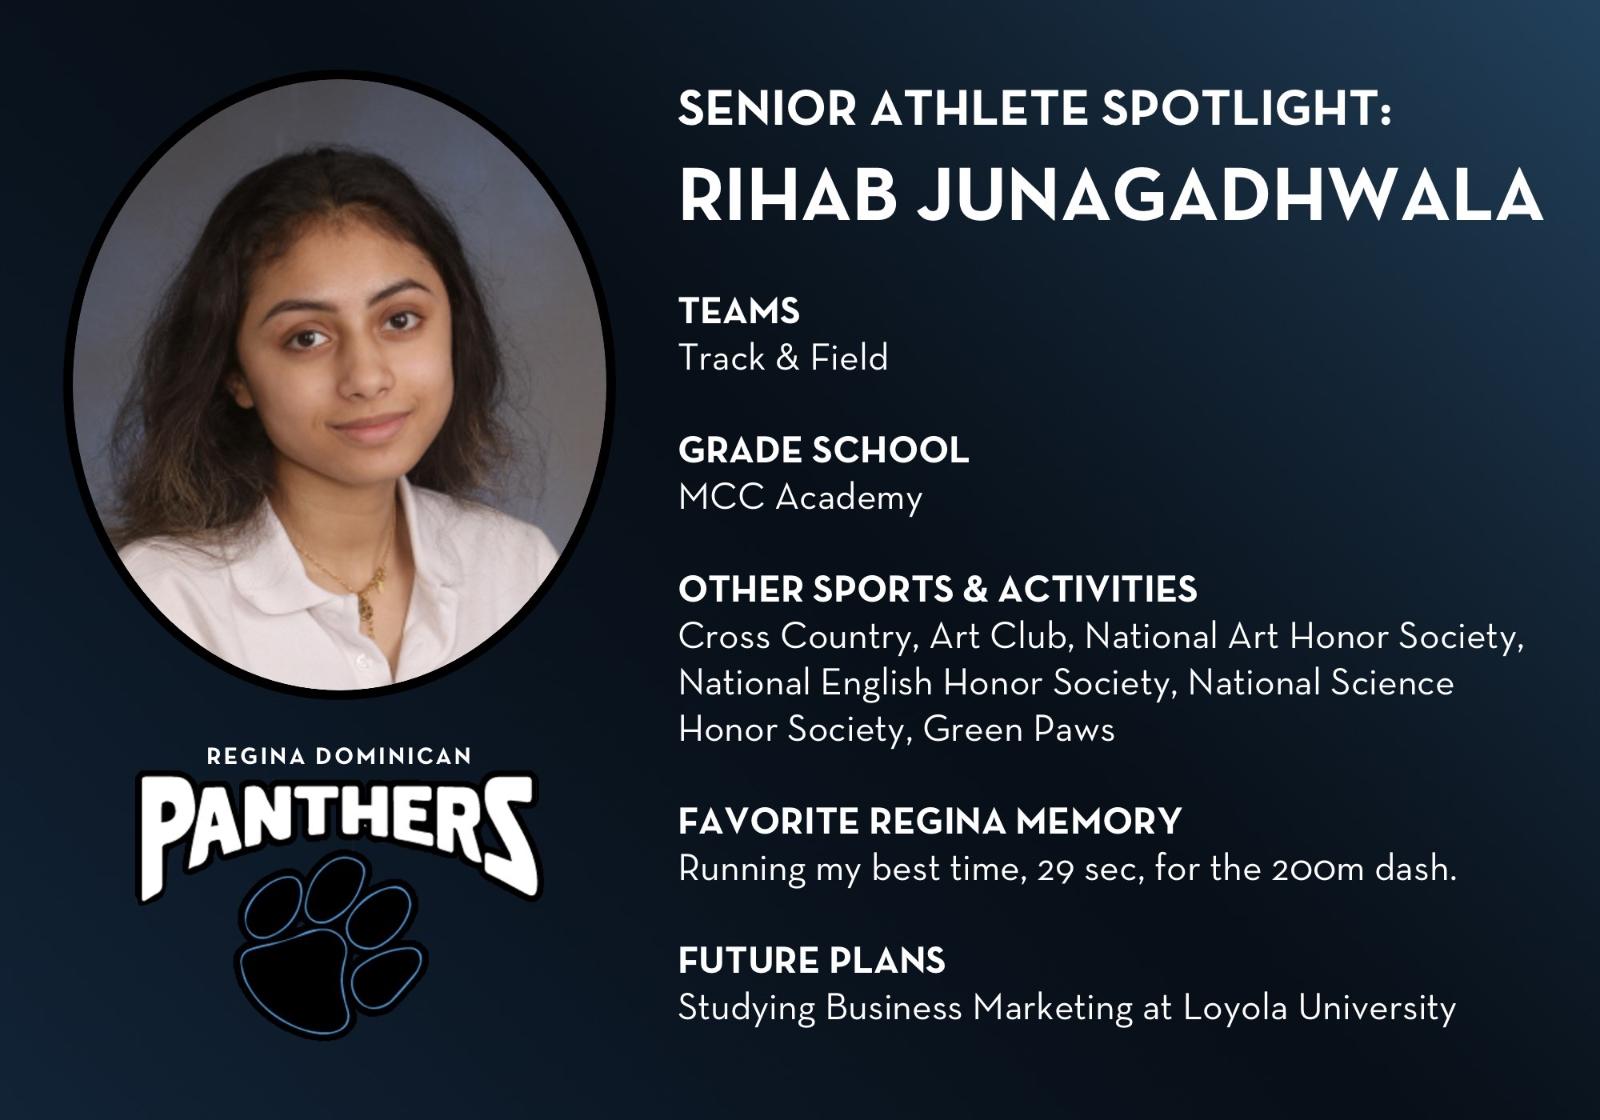 Senior Athlete Profile-Rihab Junagadhwala